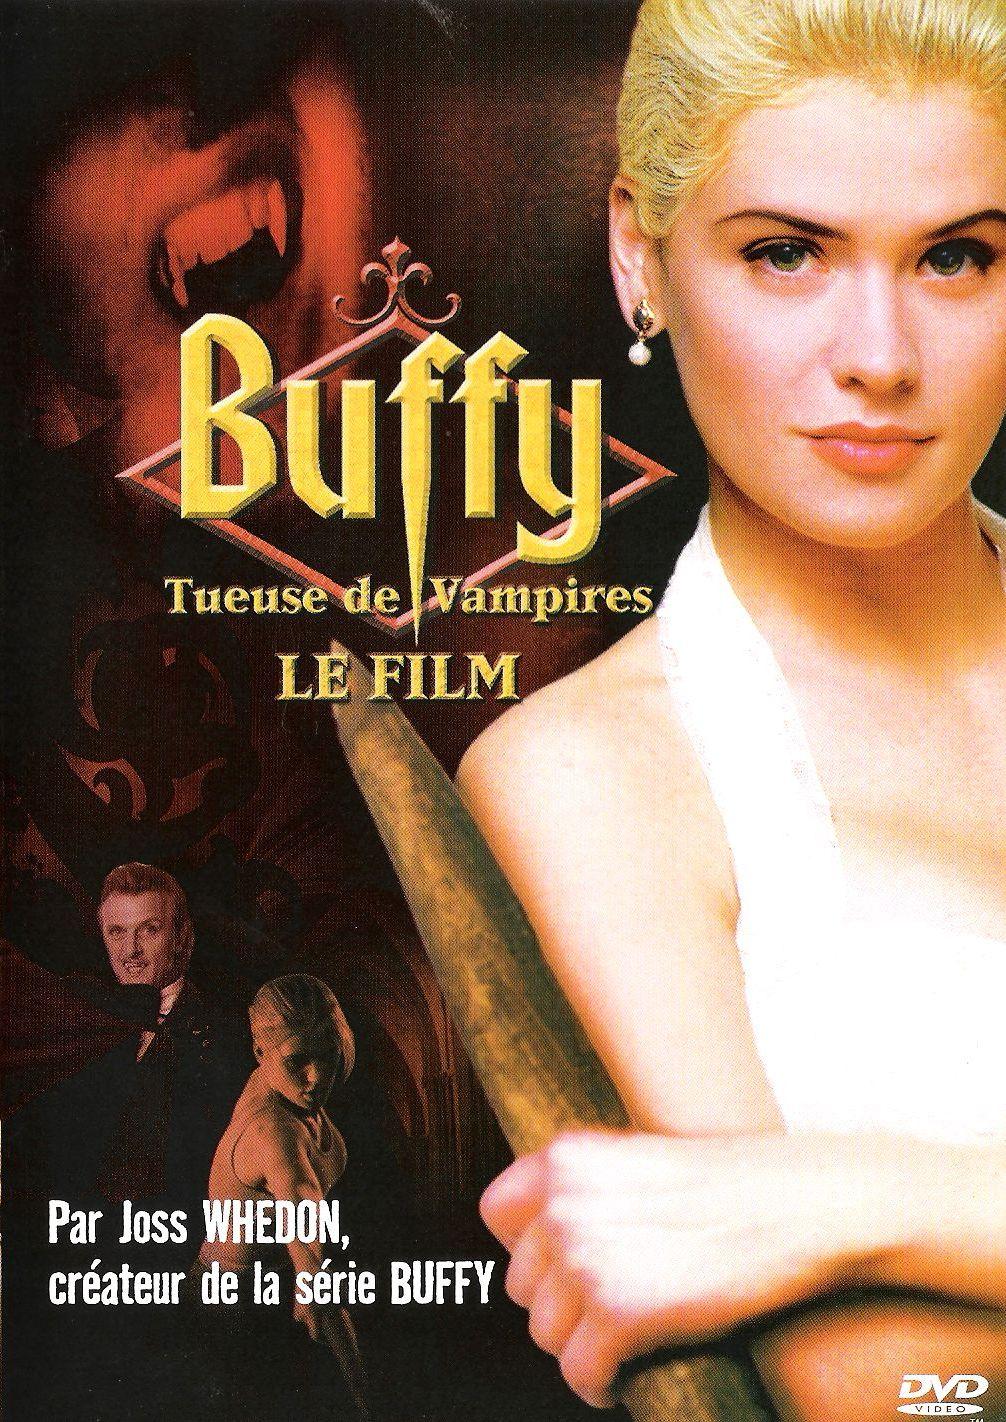 affiche du film Buffy, tueuse de vampires